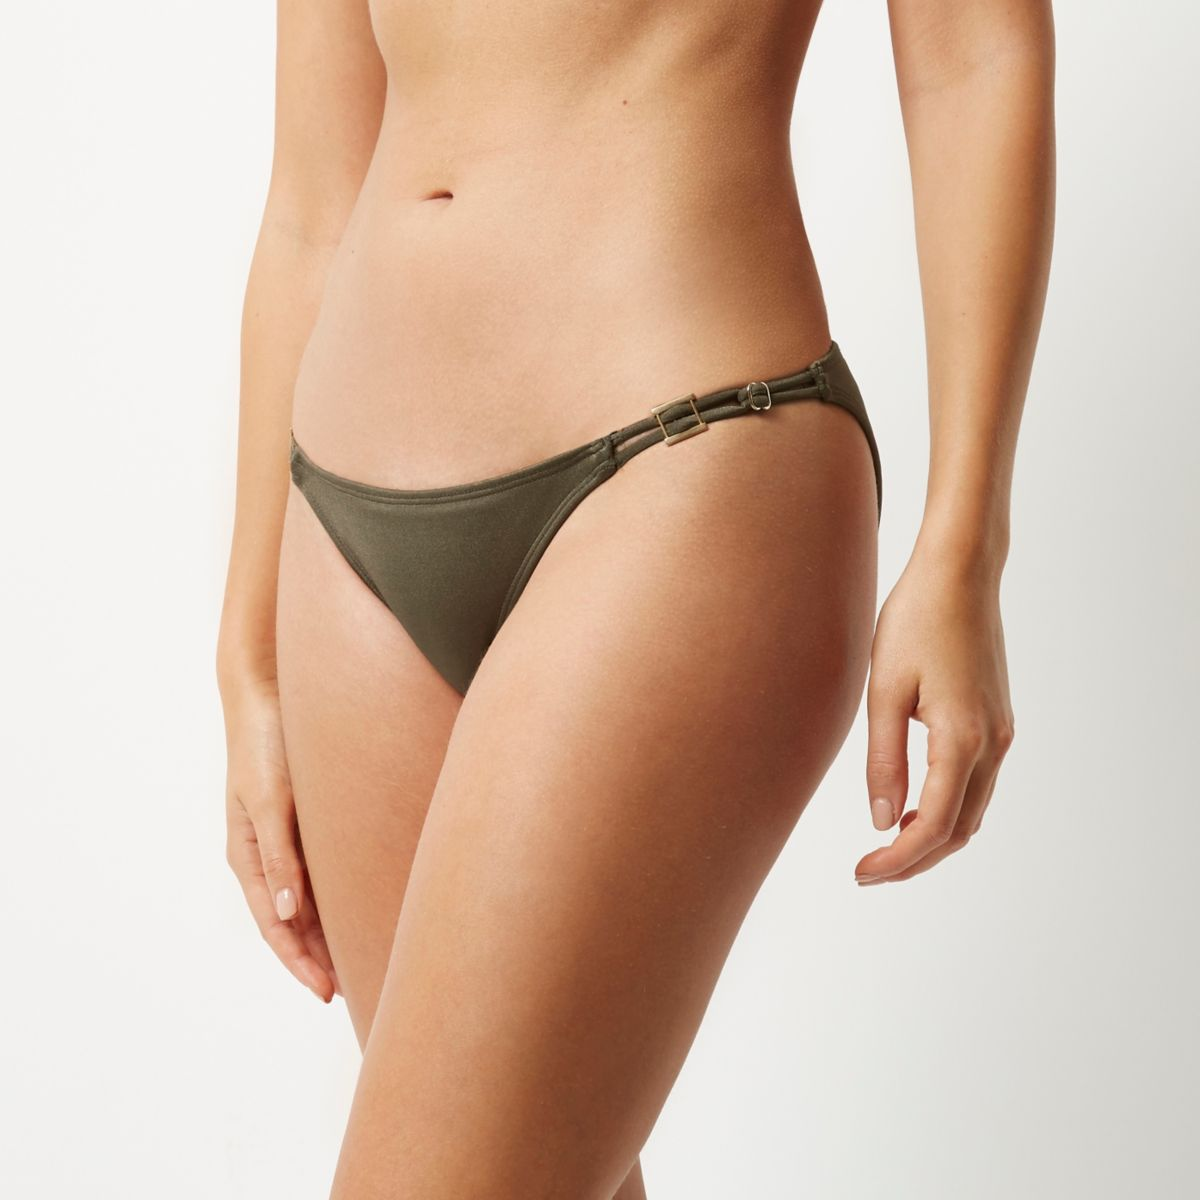 Bas de bikini kaki taille basse